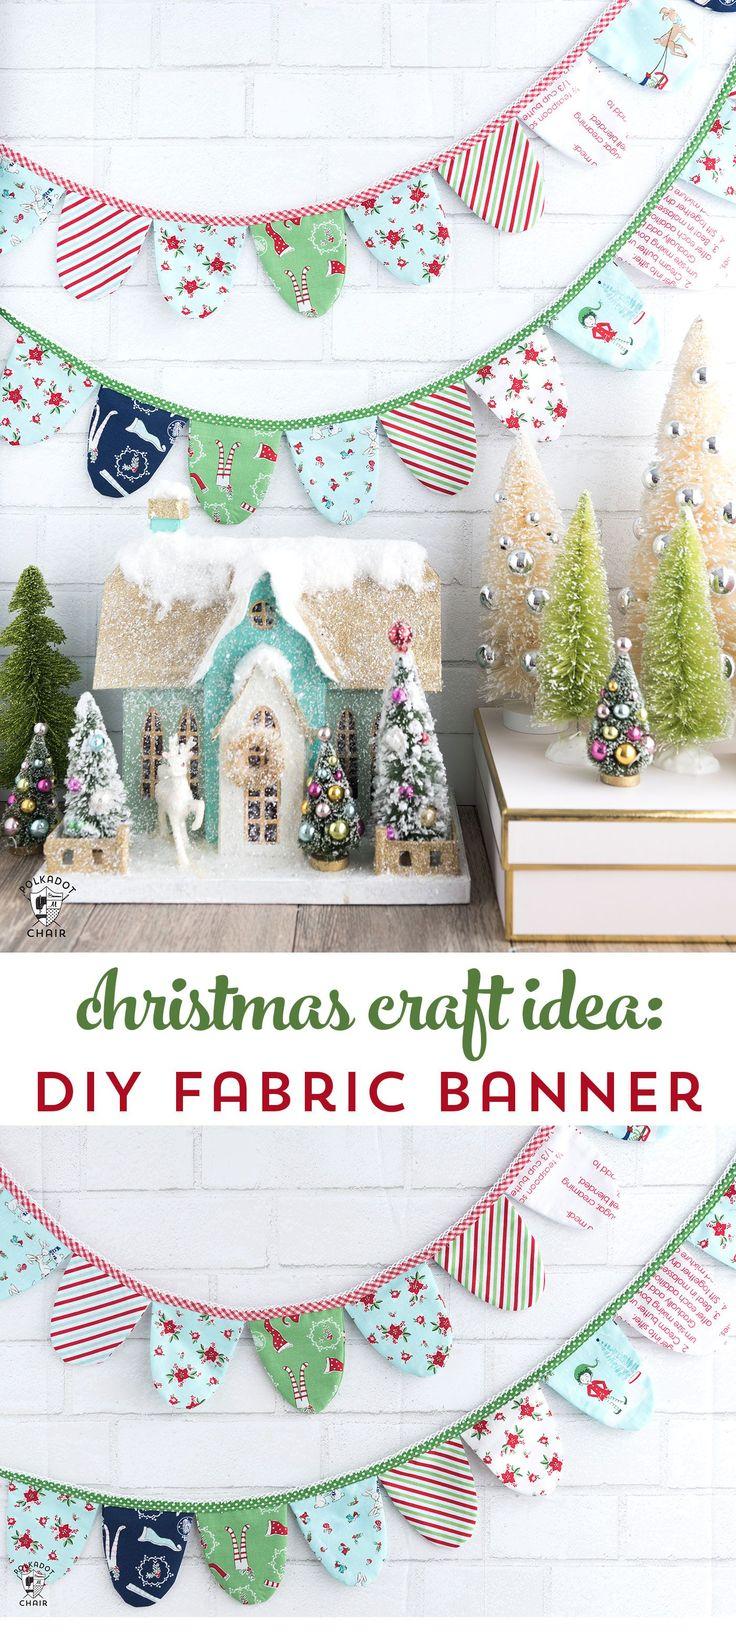 Christmas DIY : DIY Scallop Fabric Banner & Cricut Maker Giveaway